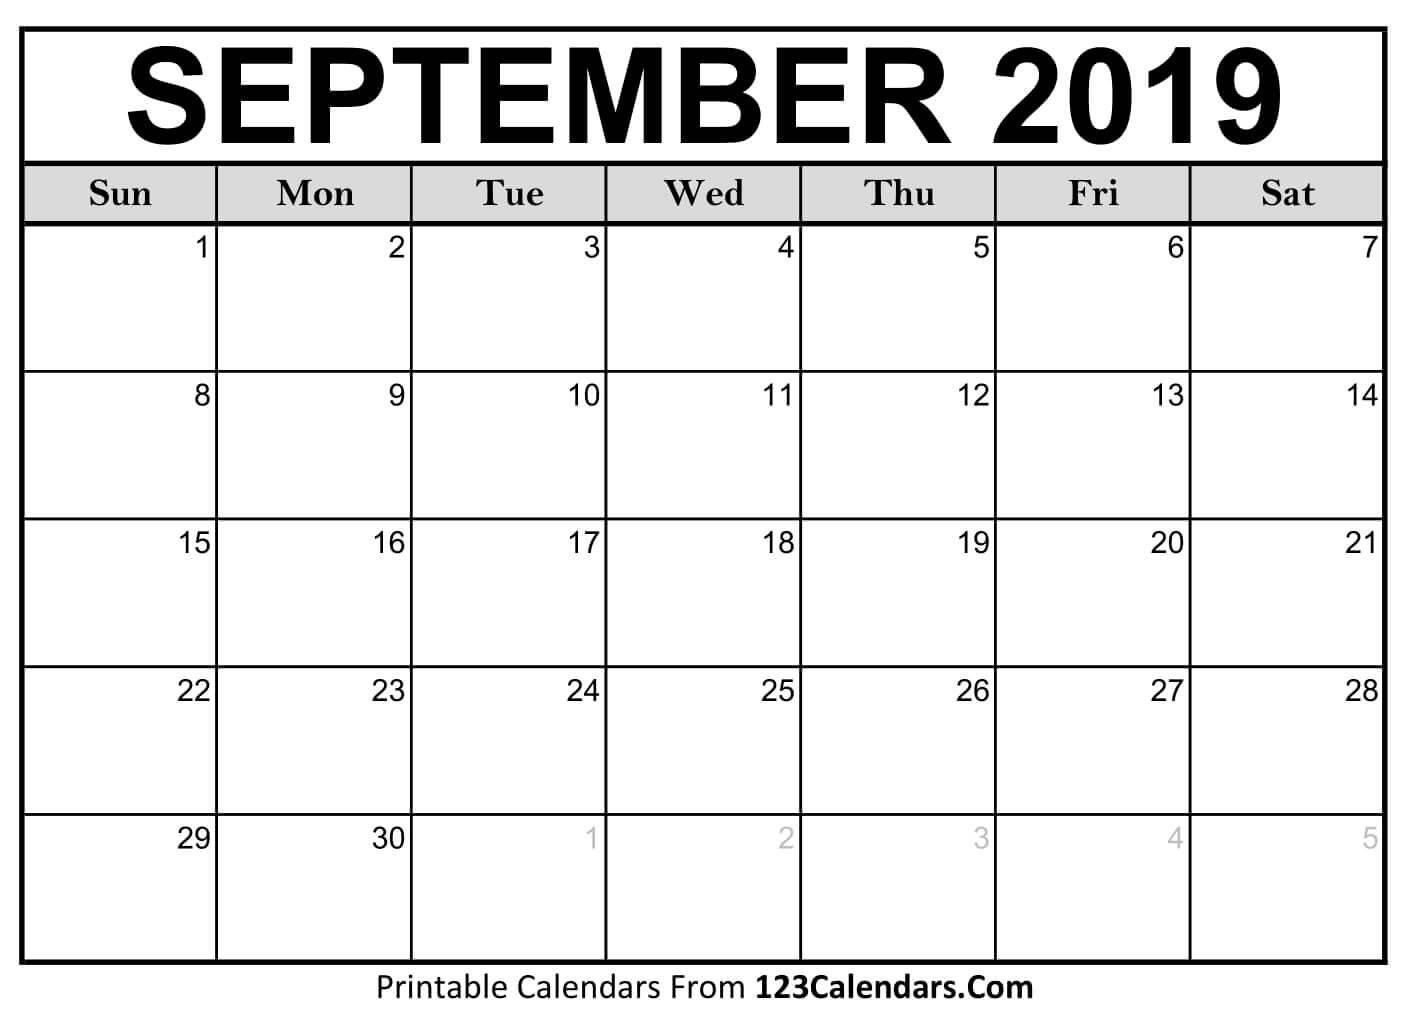 Printable September 2019 Calendar Templates – 123Calendars Calendar 2019 September